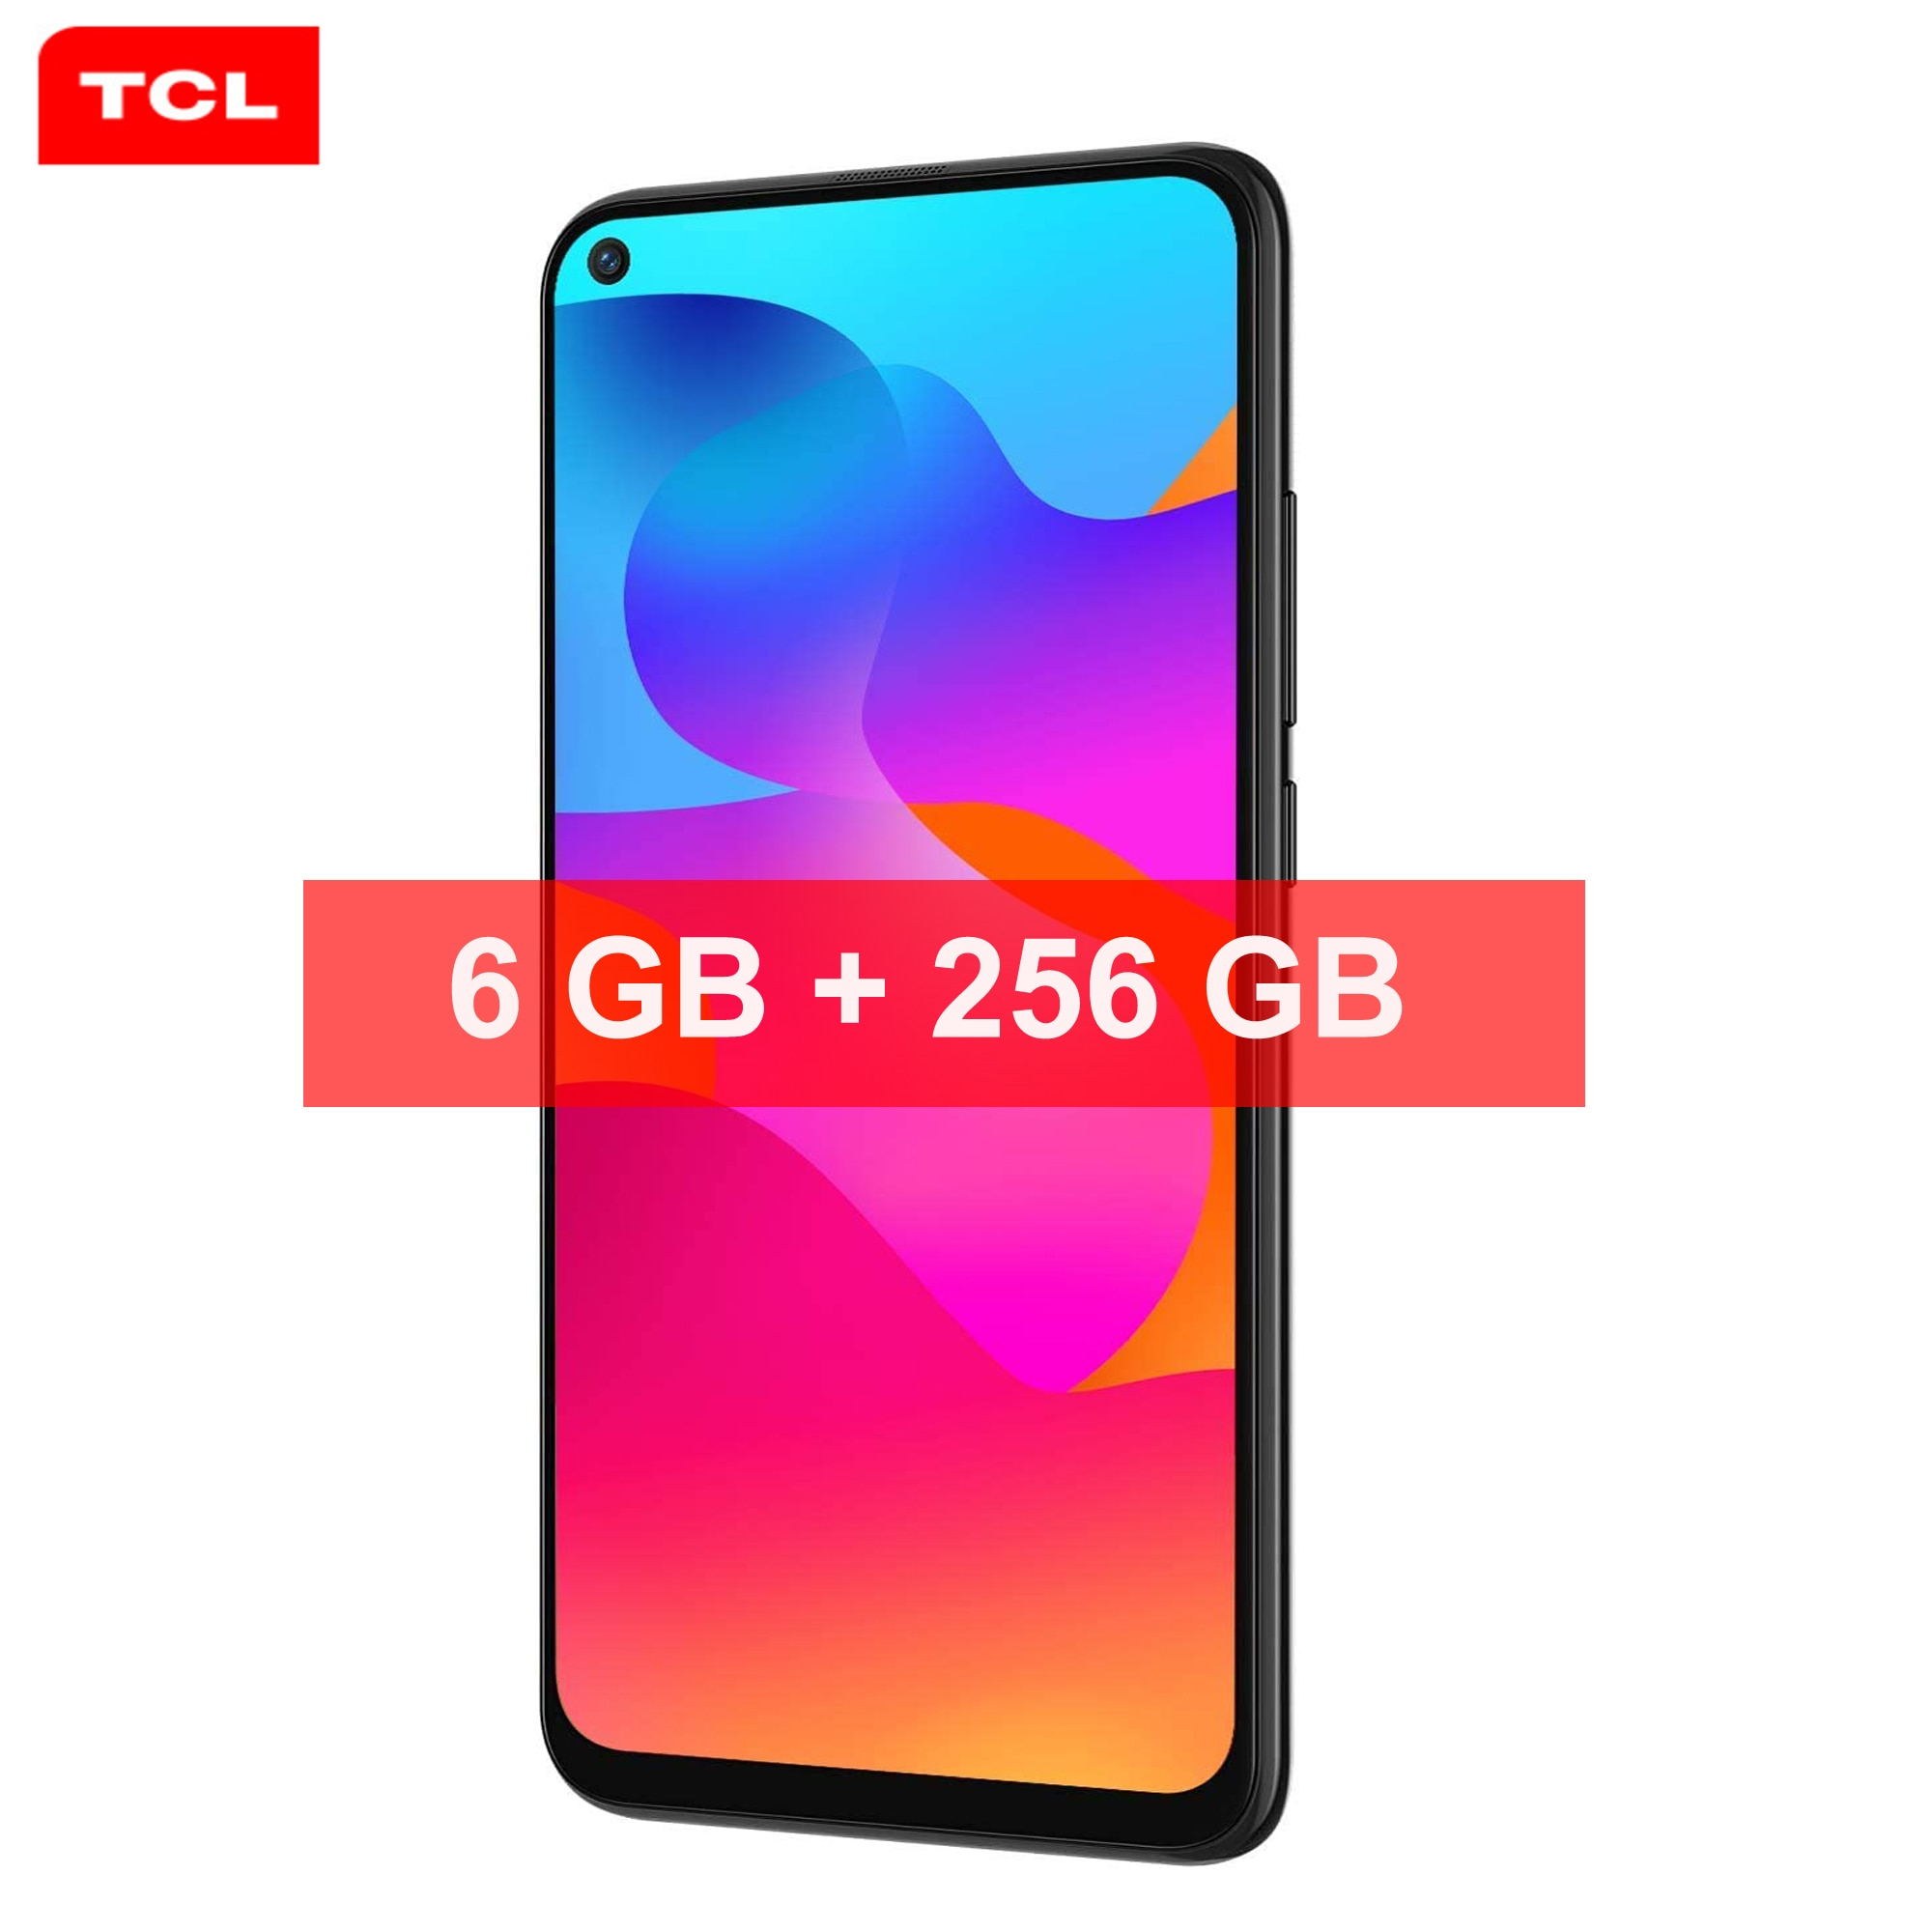 TCL 10L 6 ГБ + 256 ГБ 4000 мАч Android 10,0 смартфон на базе восьмиядерного процессора 6,53 дюйм HD + 48MP сзади Камера Face ID, функция отпечатков пальцев, 4G, мобильный ...